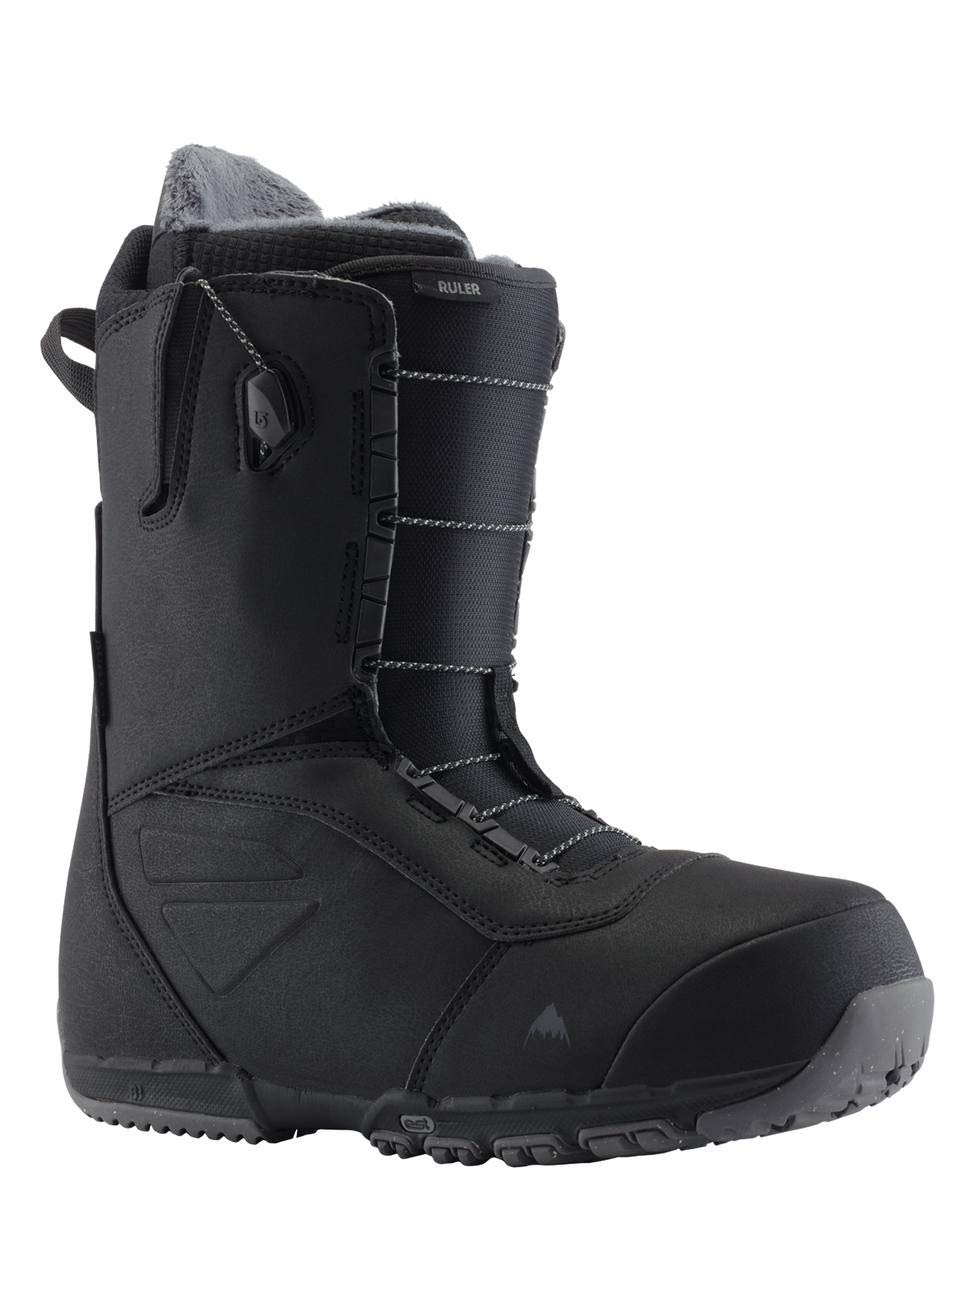 Burton Snowboard Boot Men Ruler 2019